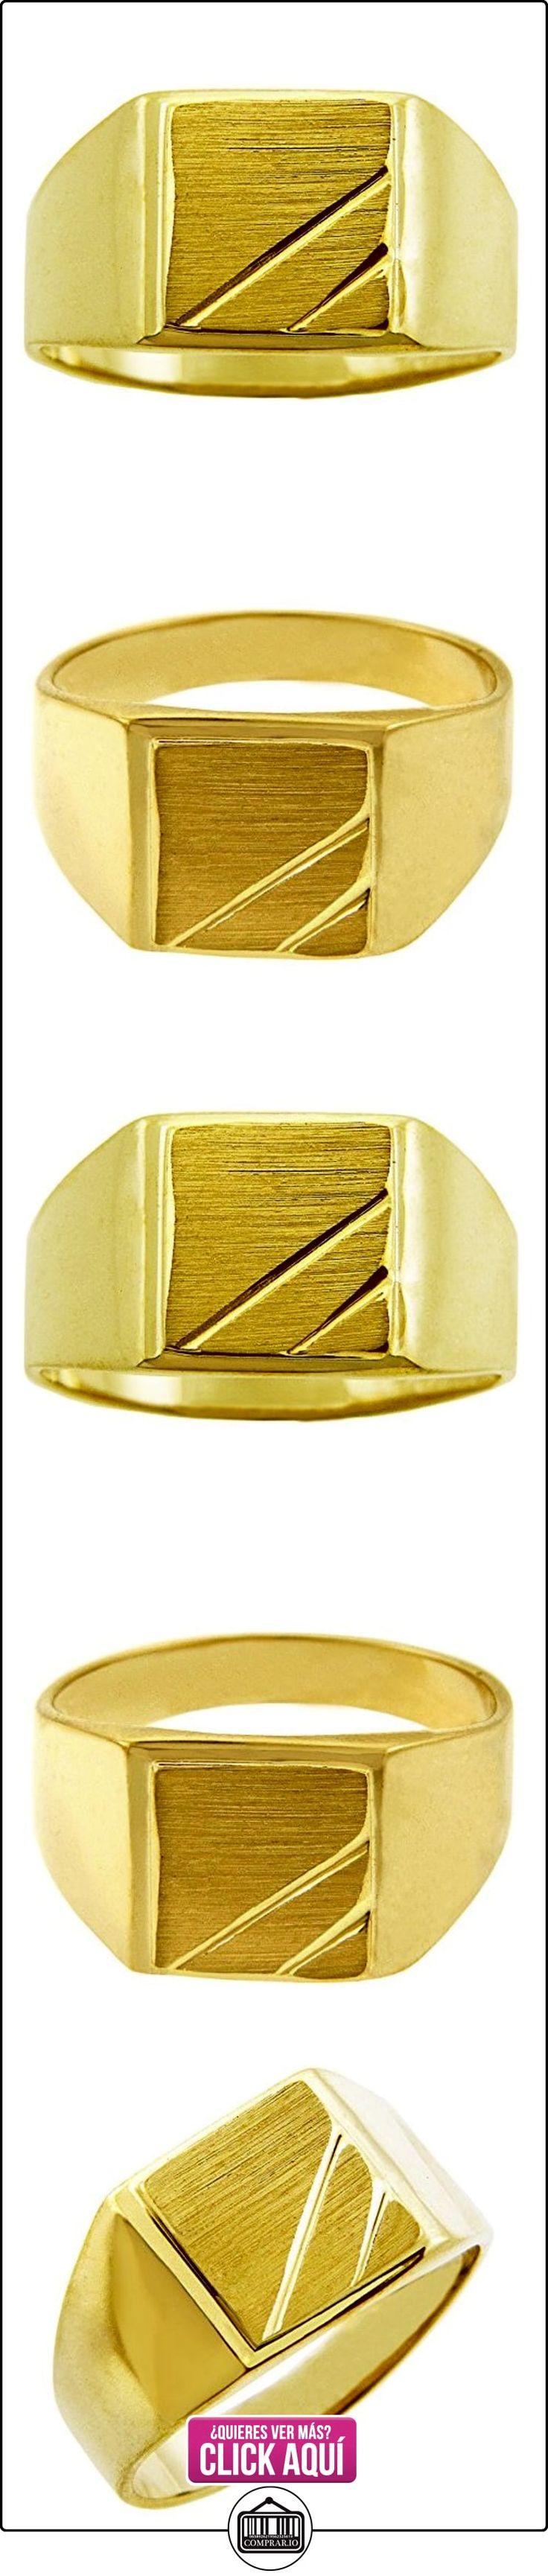 Pequeños Tesoros - Anillos Hombres Alianza De Boda 10 Kt Oro 471/1000 Sortija De sello  ✿ Joyas para hombres especiales - lujo ✿ ▬► Ver oferta: https://comprar.io/goto/B01277ZP4O